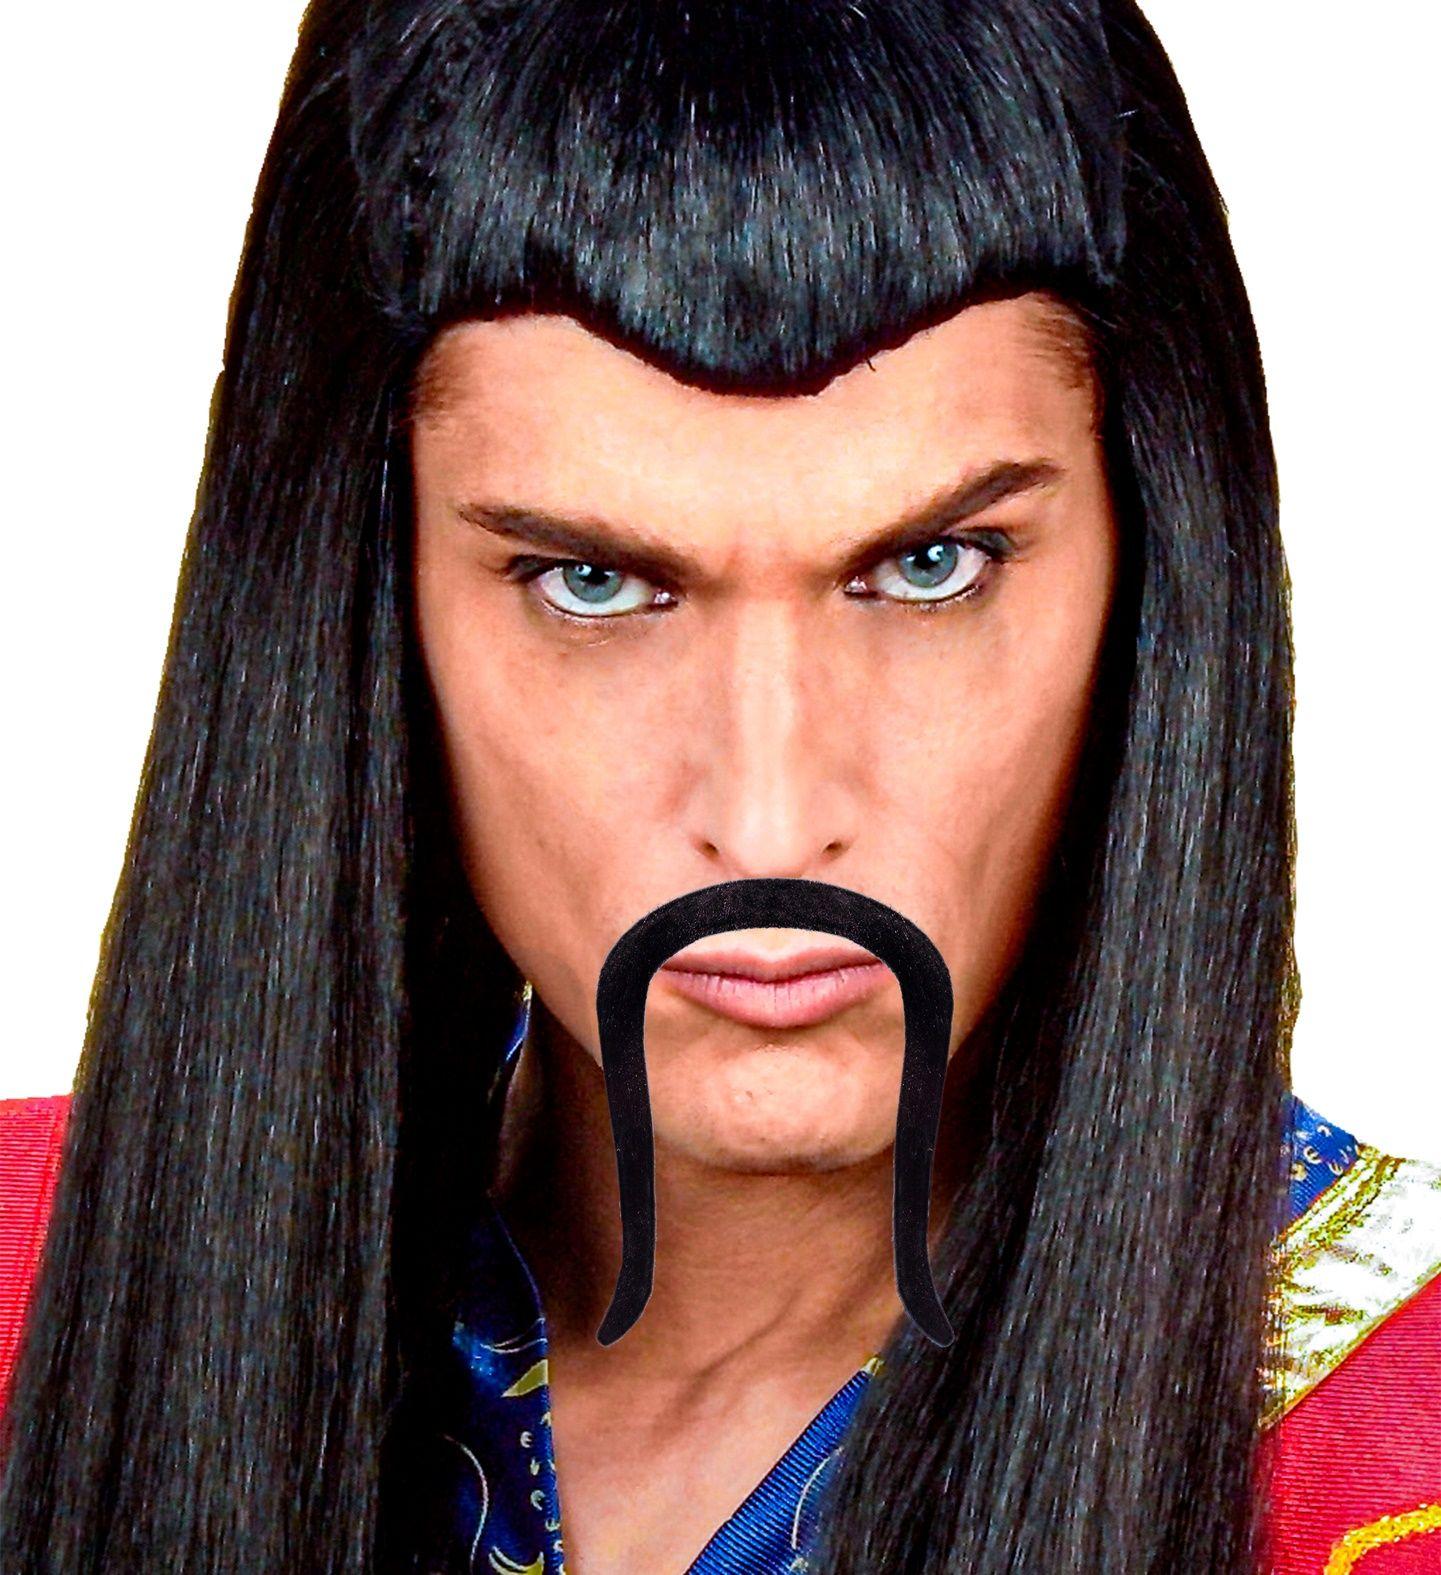 Samurai snor zwart